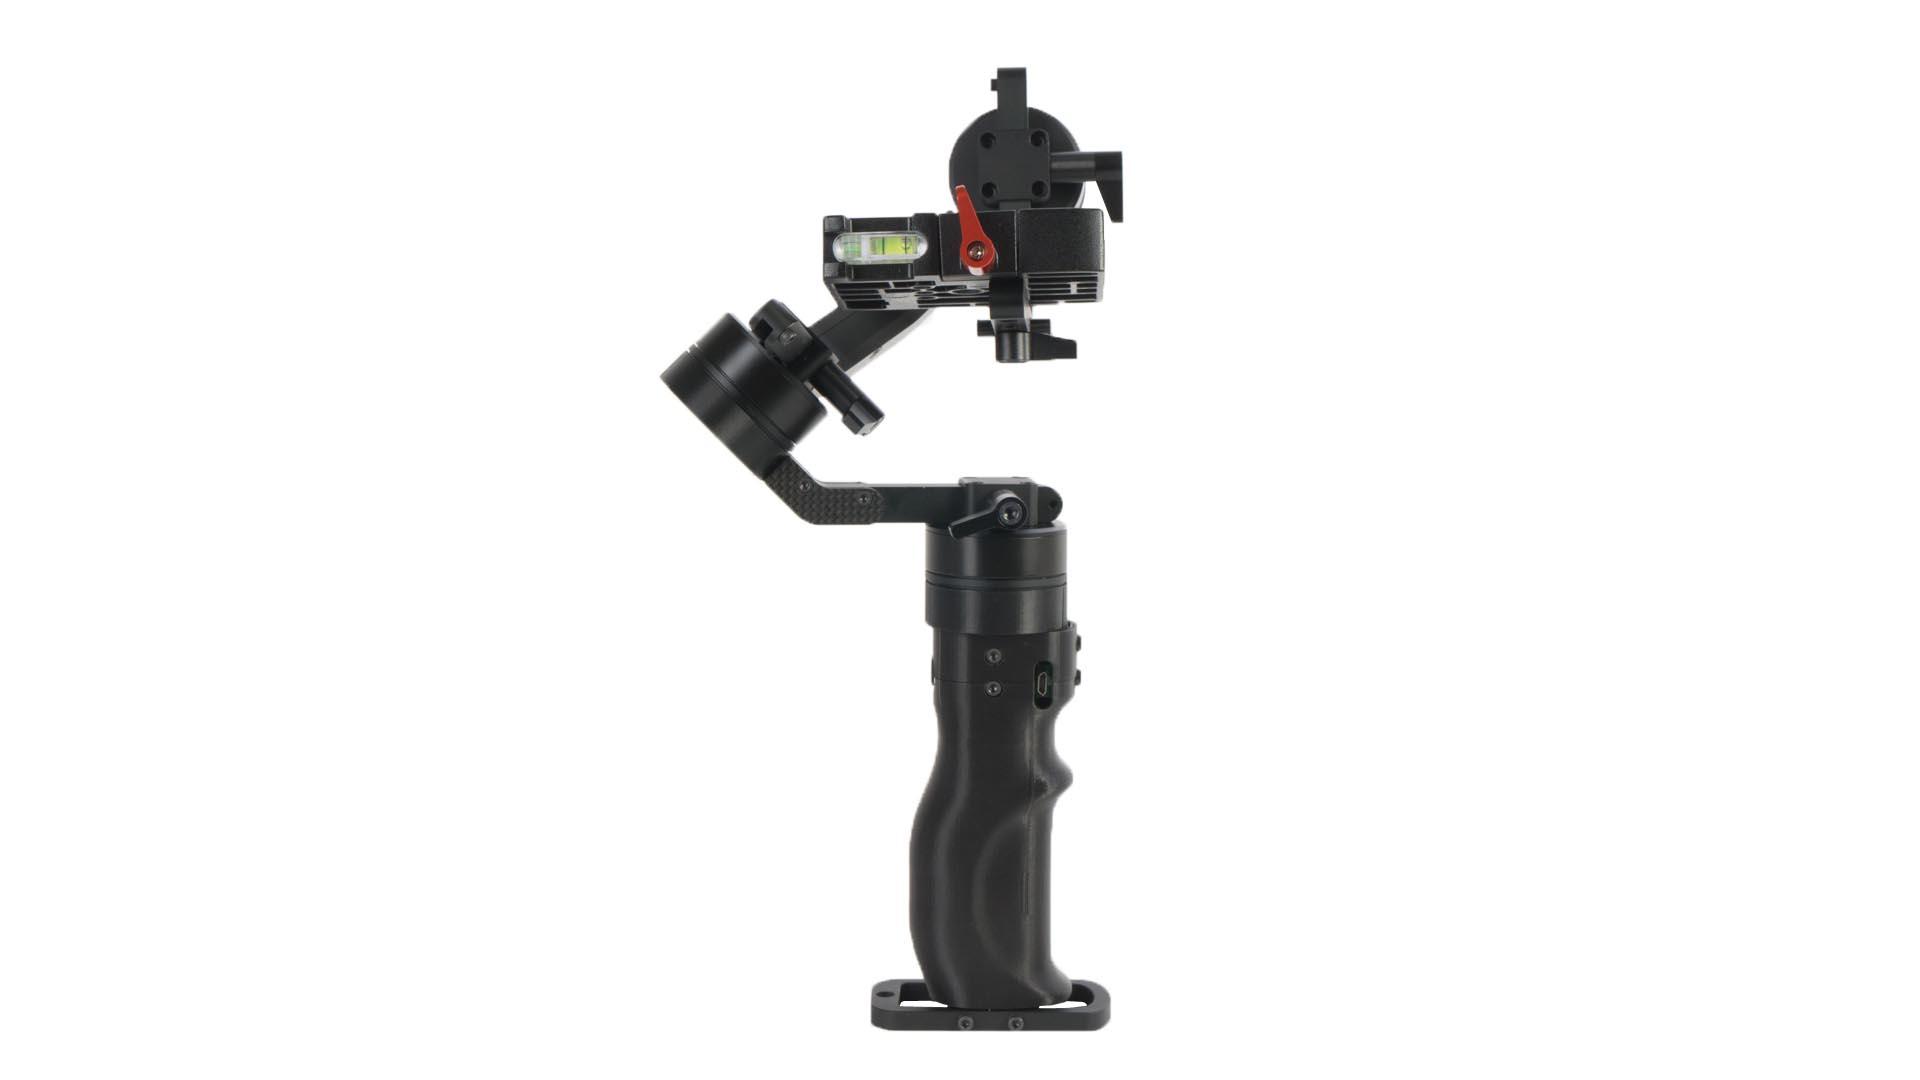 icecam gimbal tiny 3 vision senza camera 1